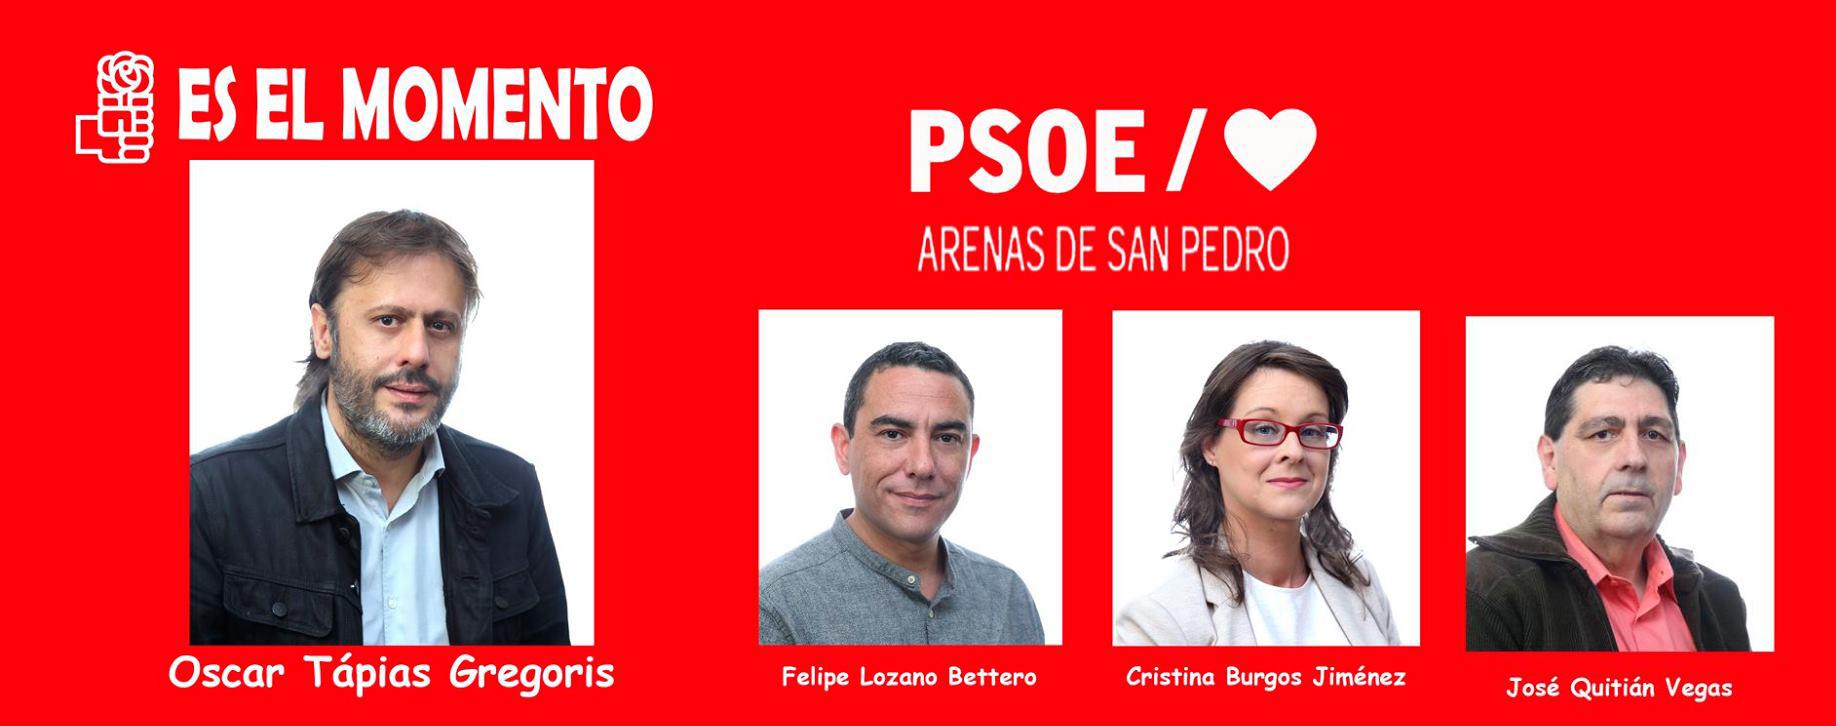 Concejales del PSOE - Arenas de San Pedro - TiétarTeVe